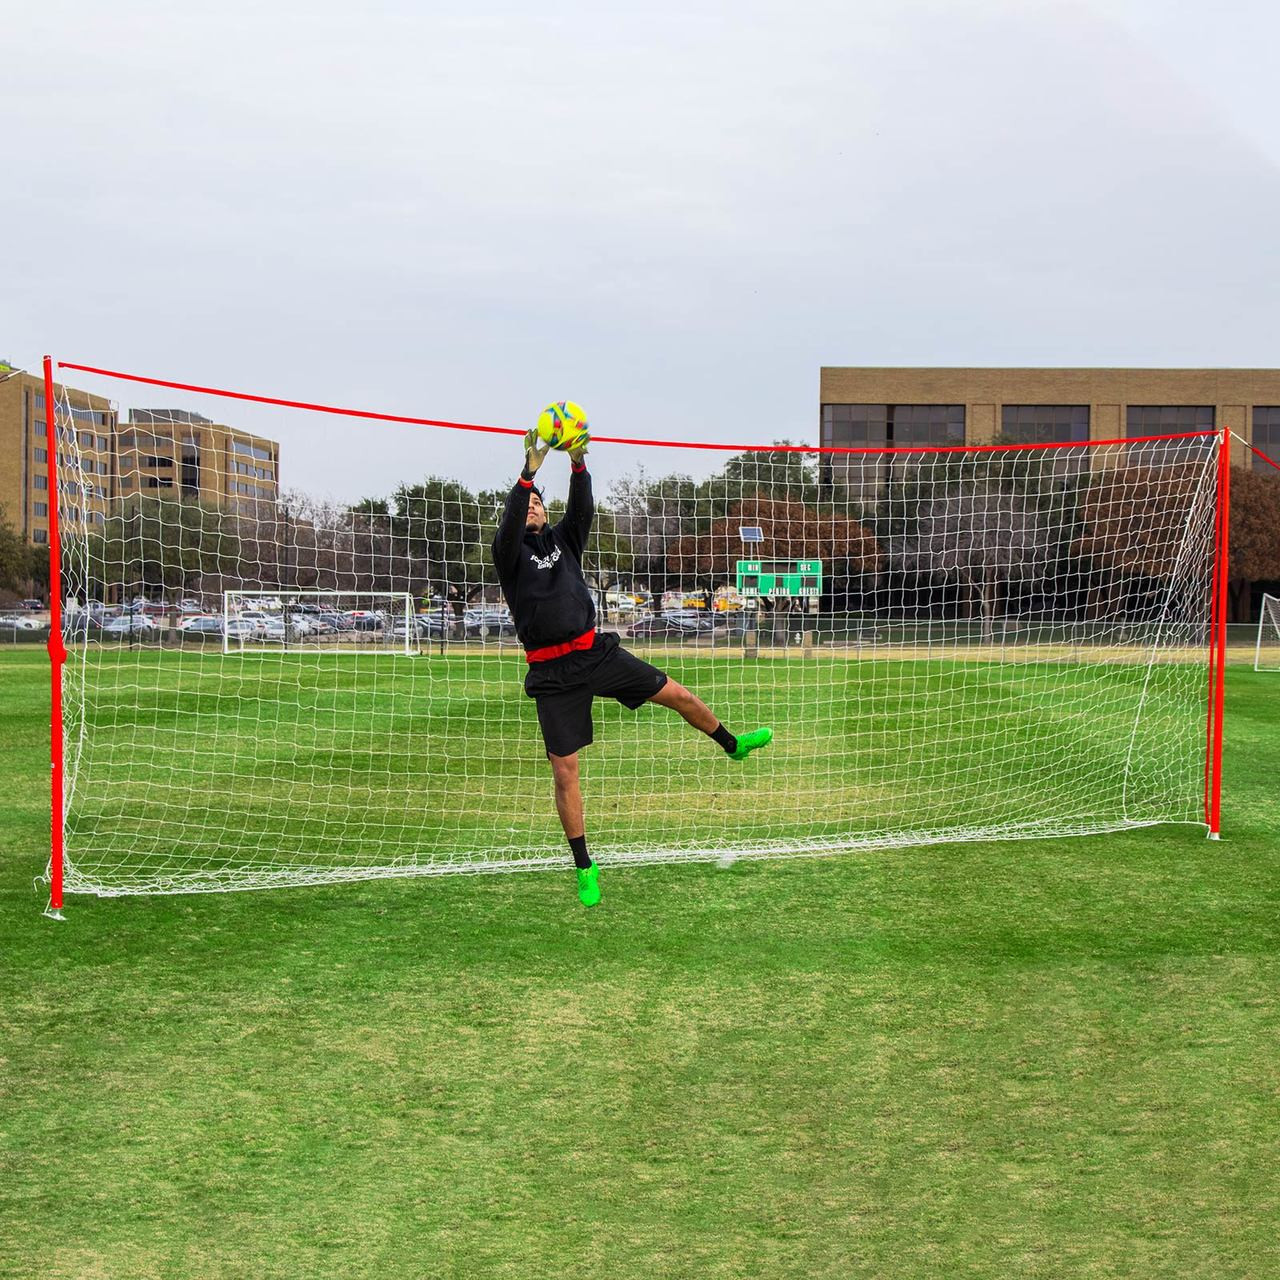 4ab8bfb41 ... J-Goal Regulation Size Portable Goal 6x12 | Soccer Innovations Training  Equipment & Soccer Goals ...